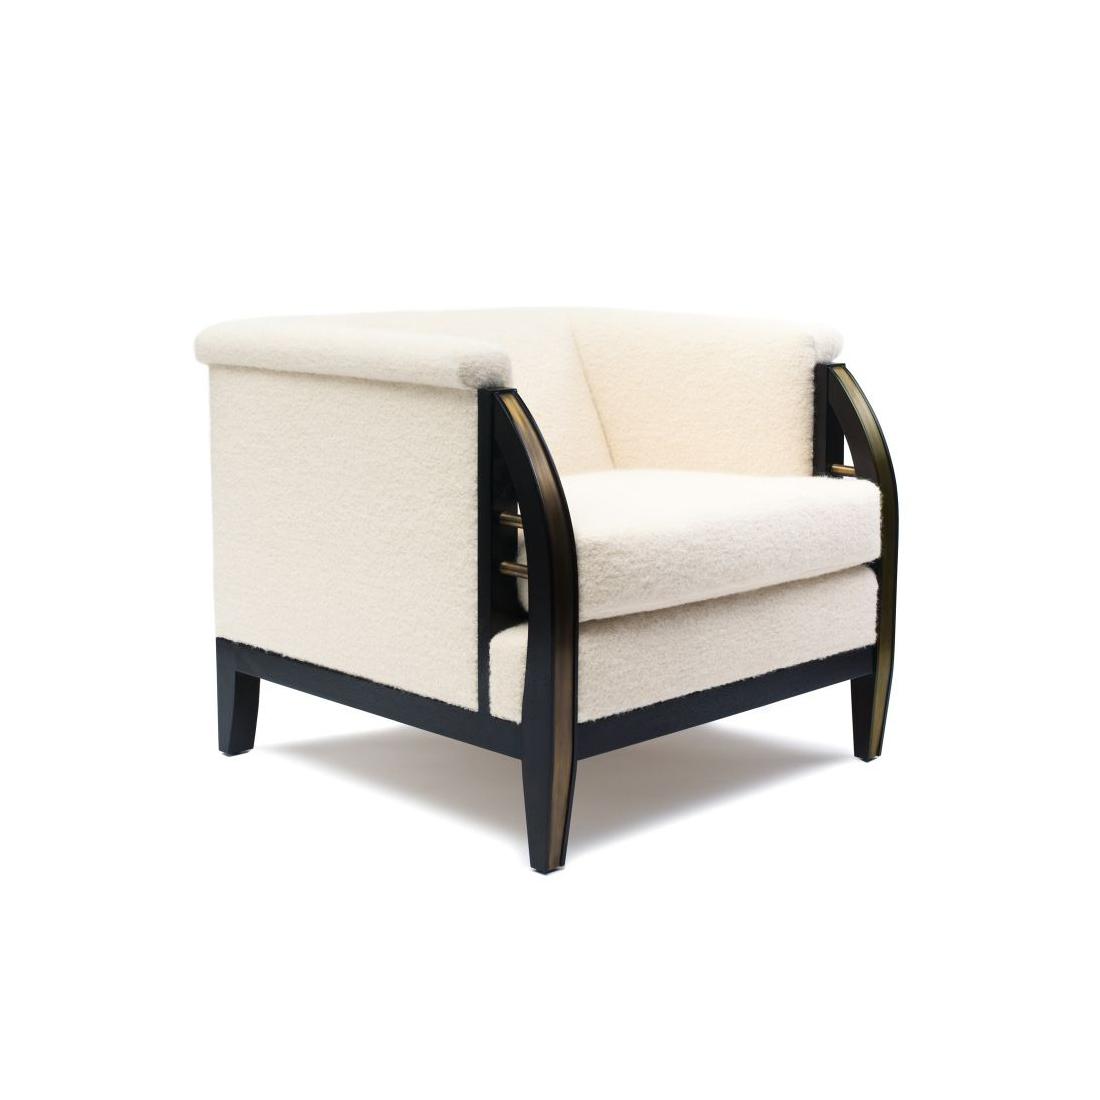 Evora Arm Chair by Jean De Merry